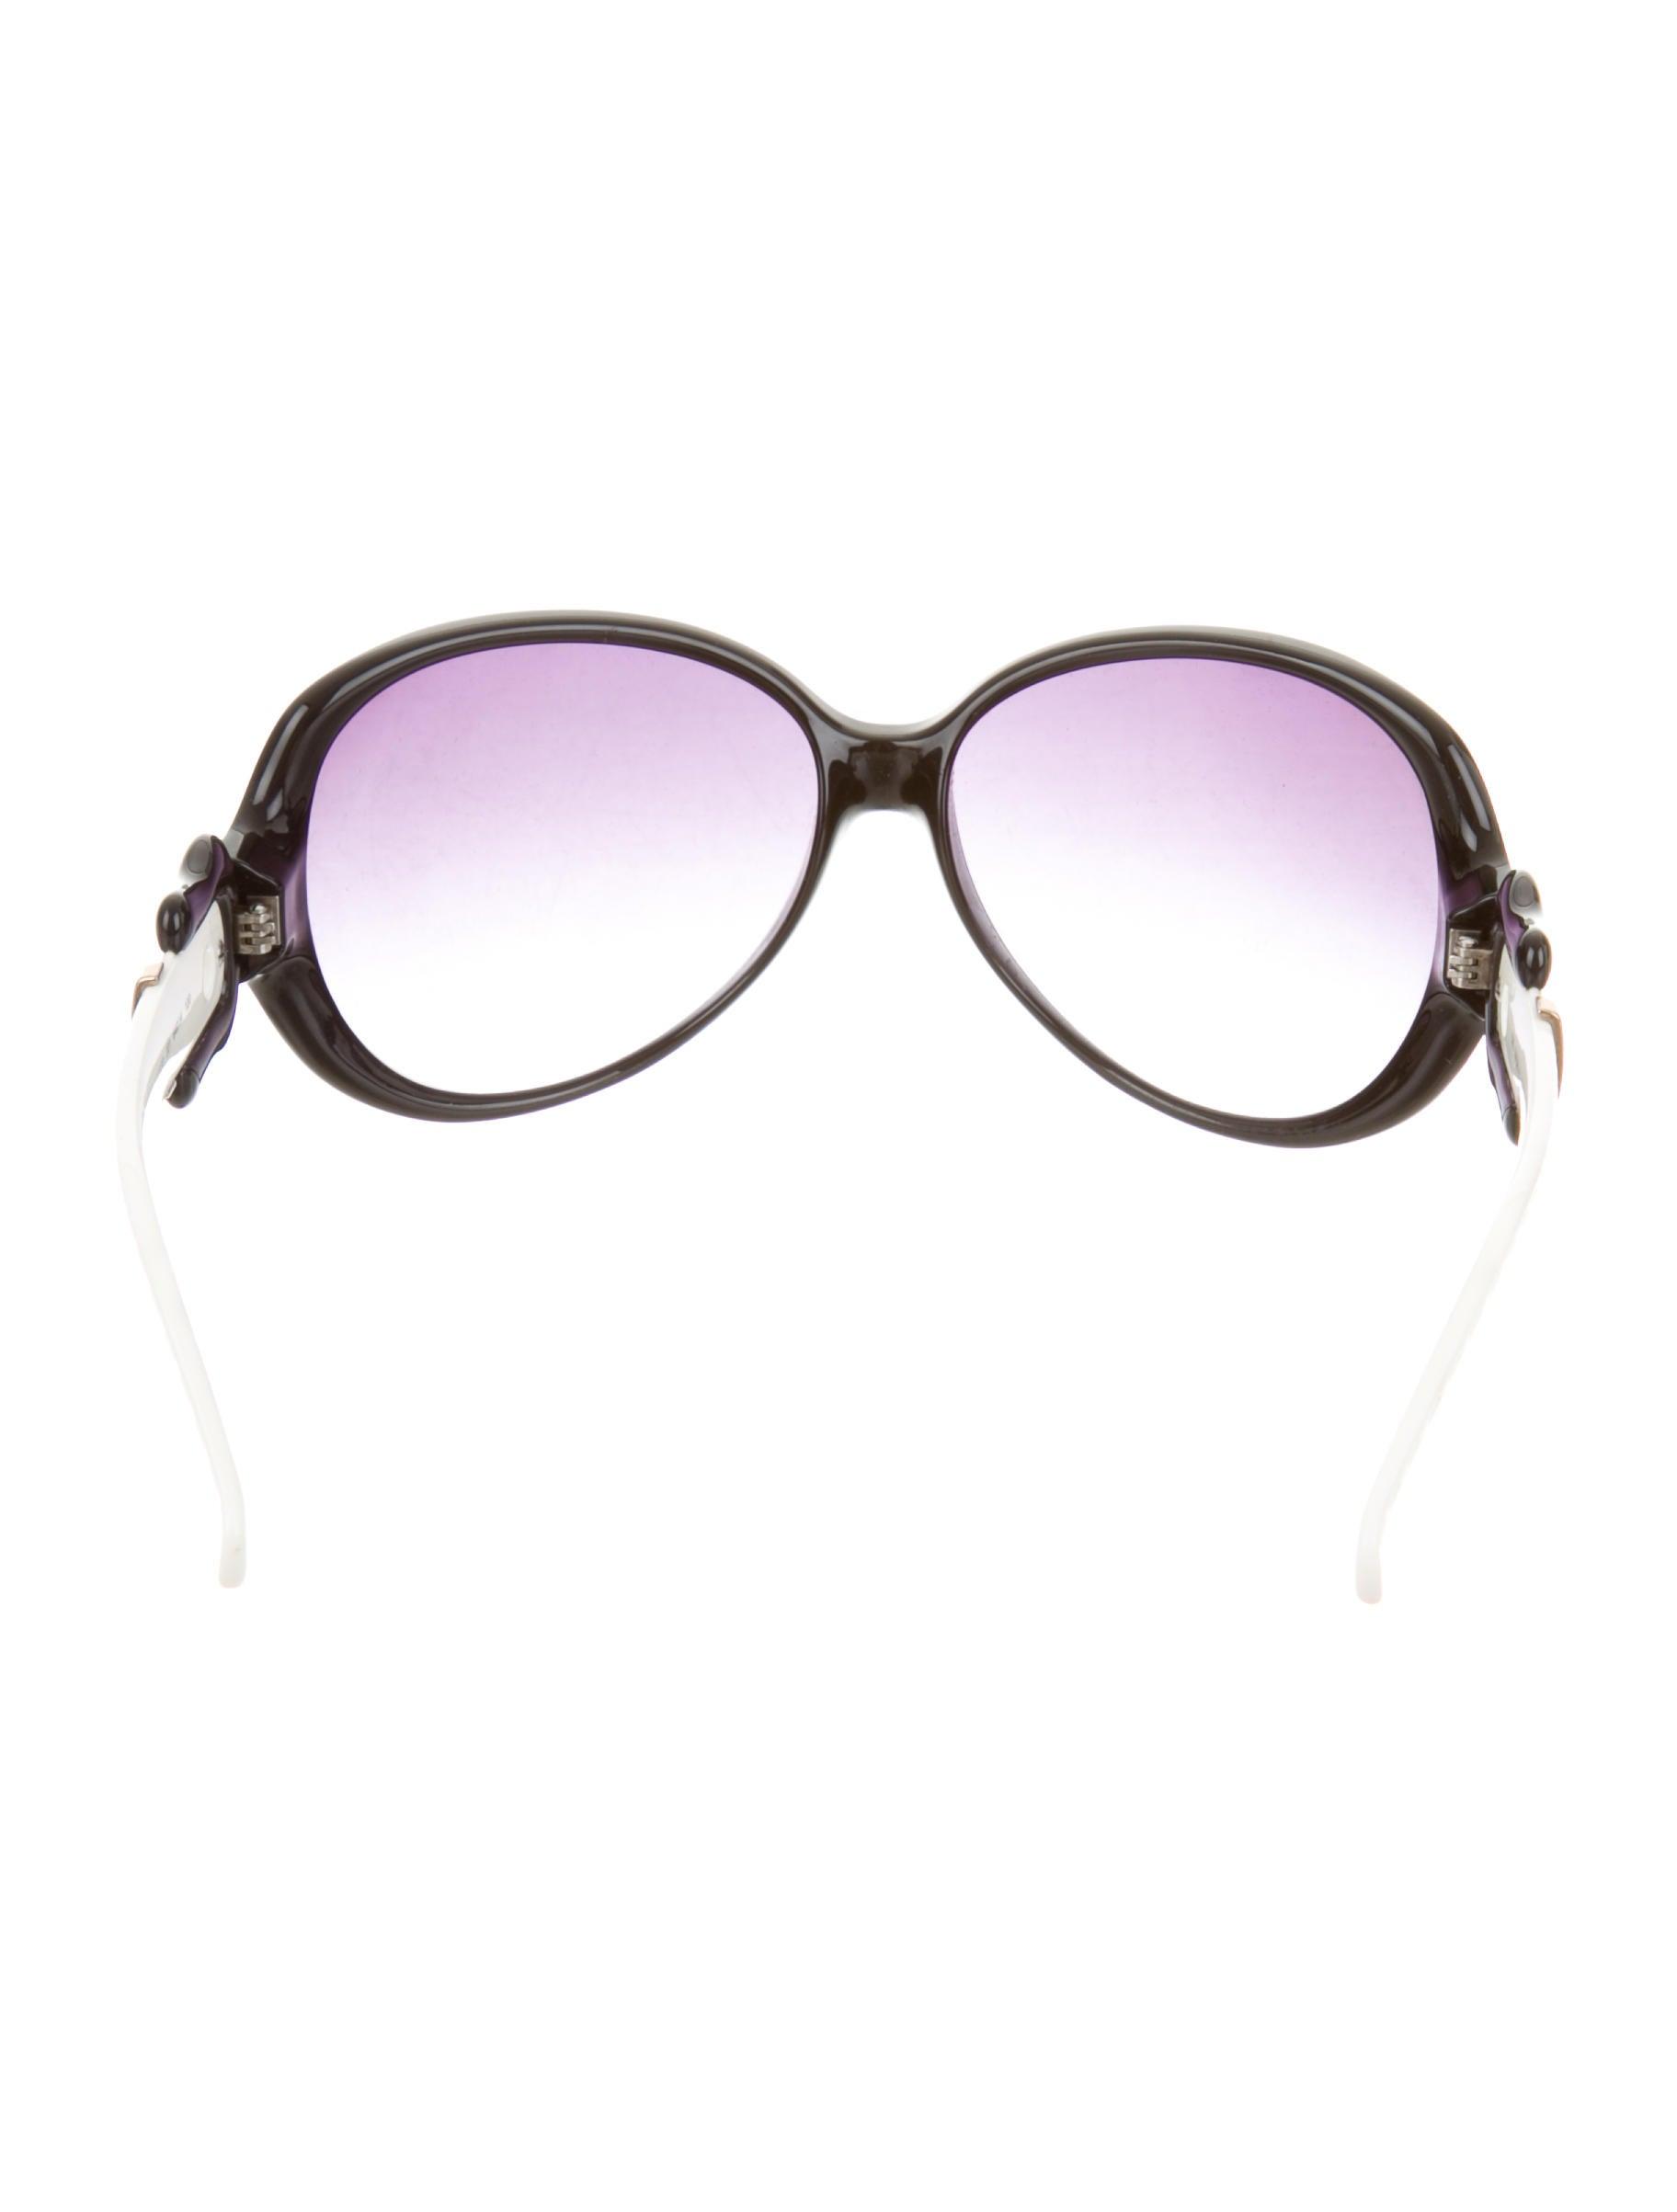 773ee90687 Fendi Round Oversize Sunglasses - Accessories - FEN39296